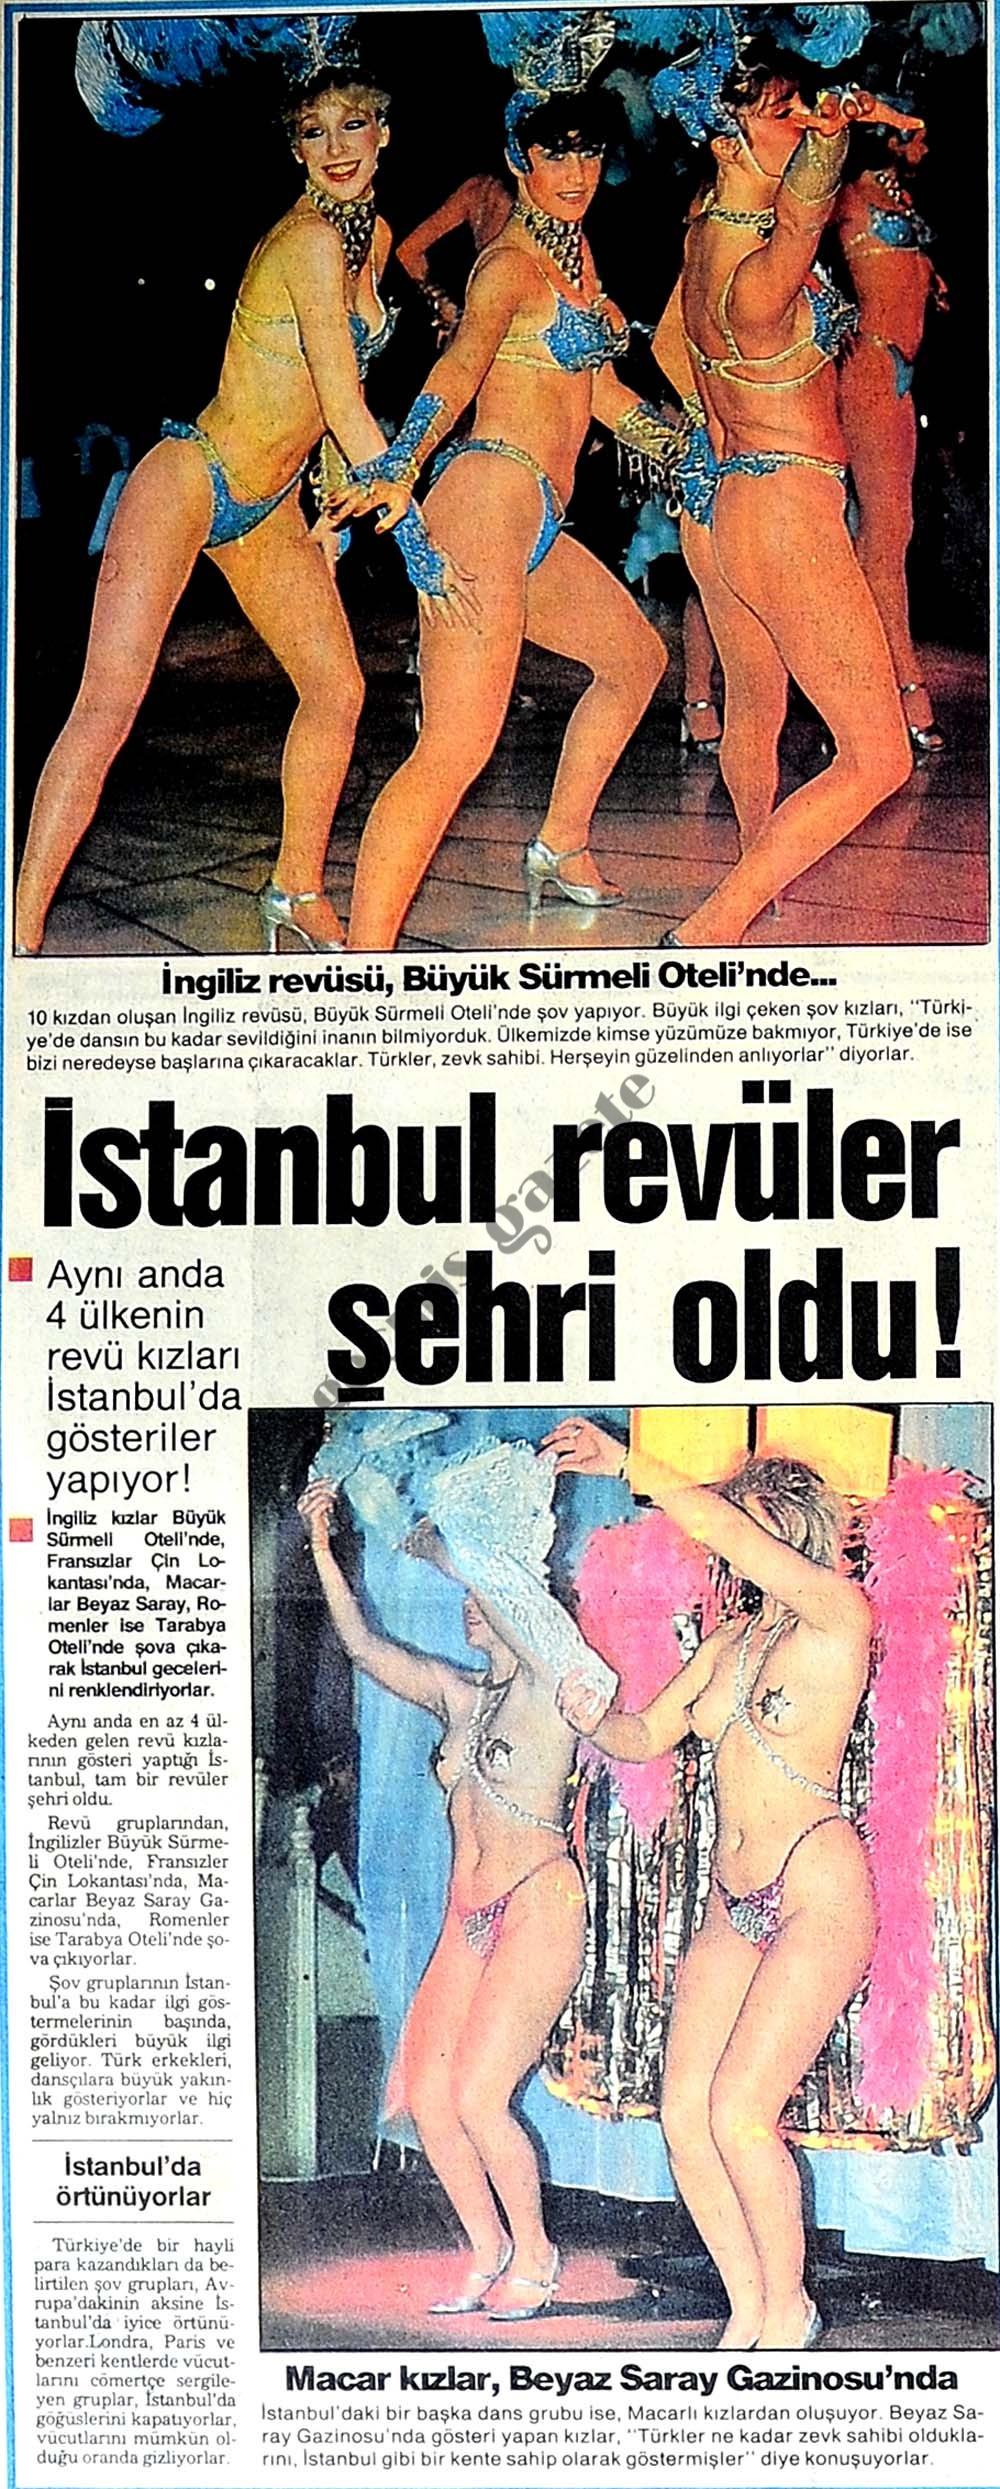 İstanbul revüler şehri oldu!